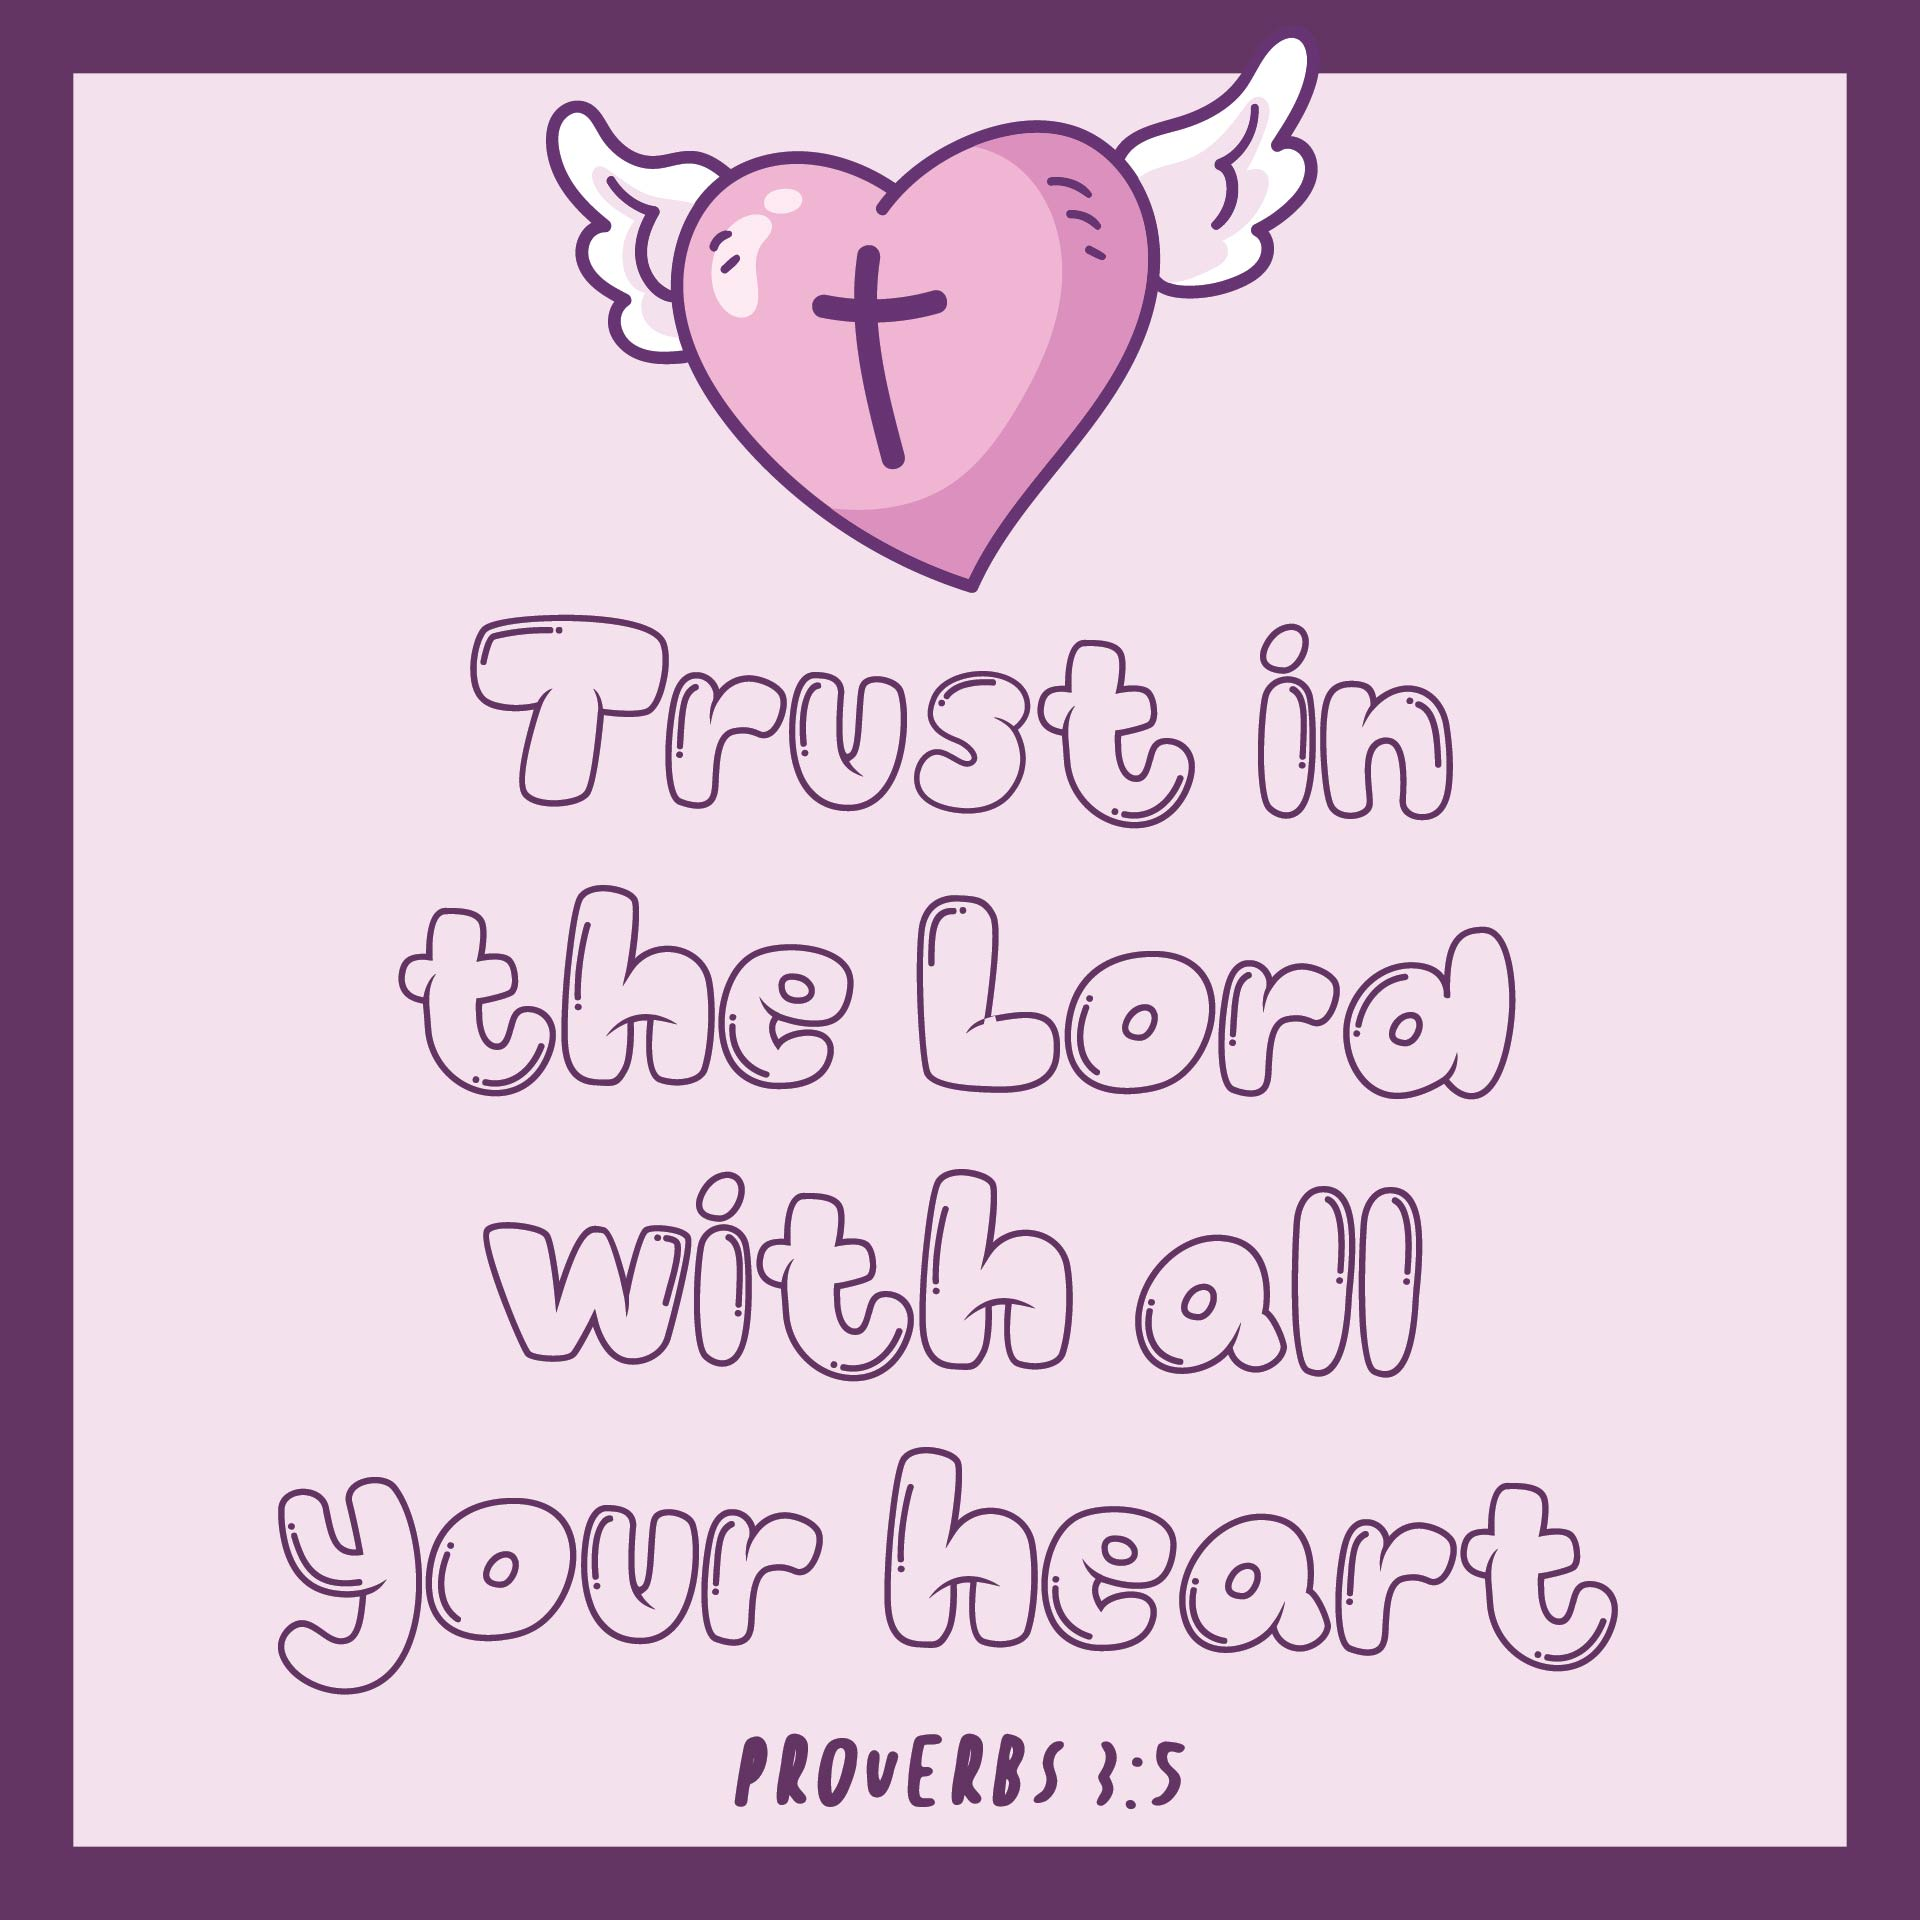 Printable Christian Valentine Day Card